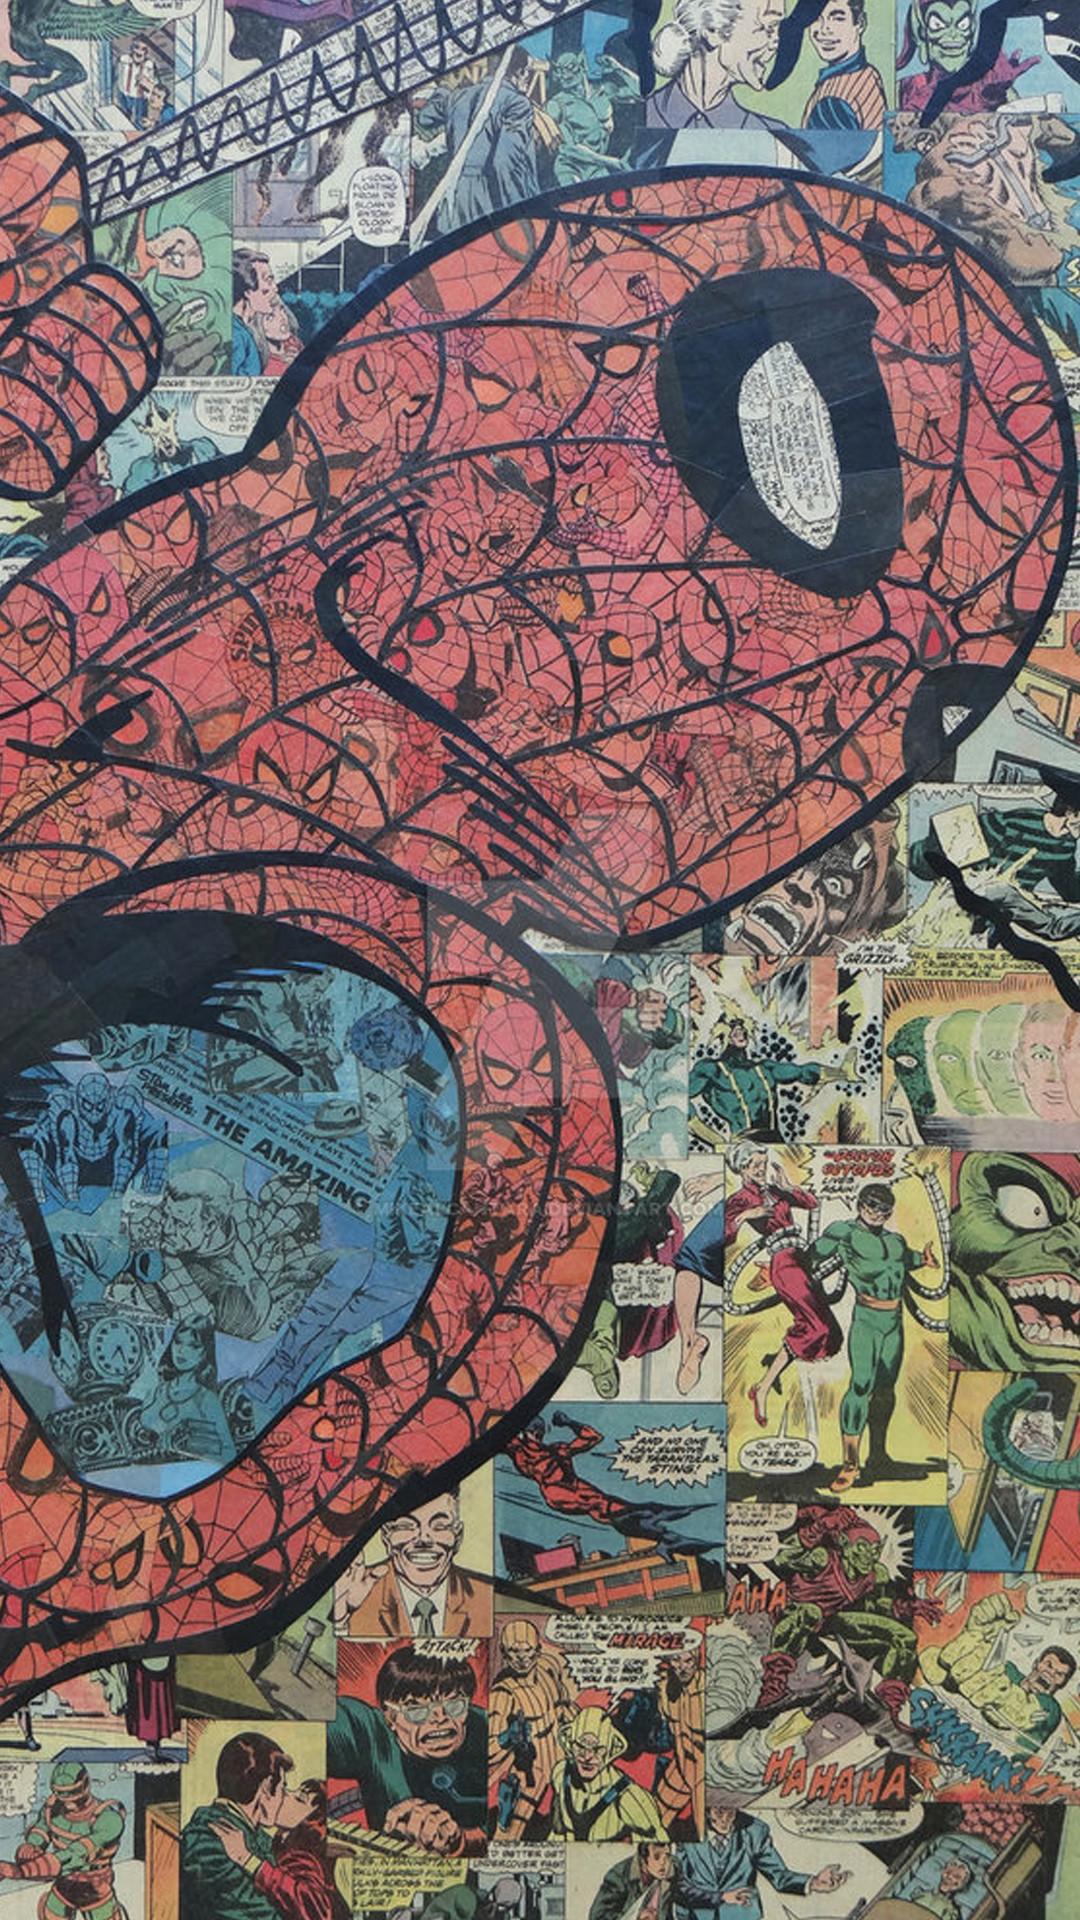 Marvel dc comics · Phone wallpaper from Zedge – Spiderman comic